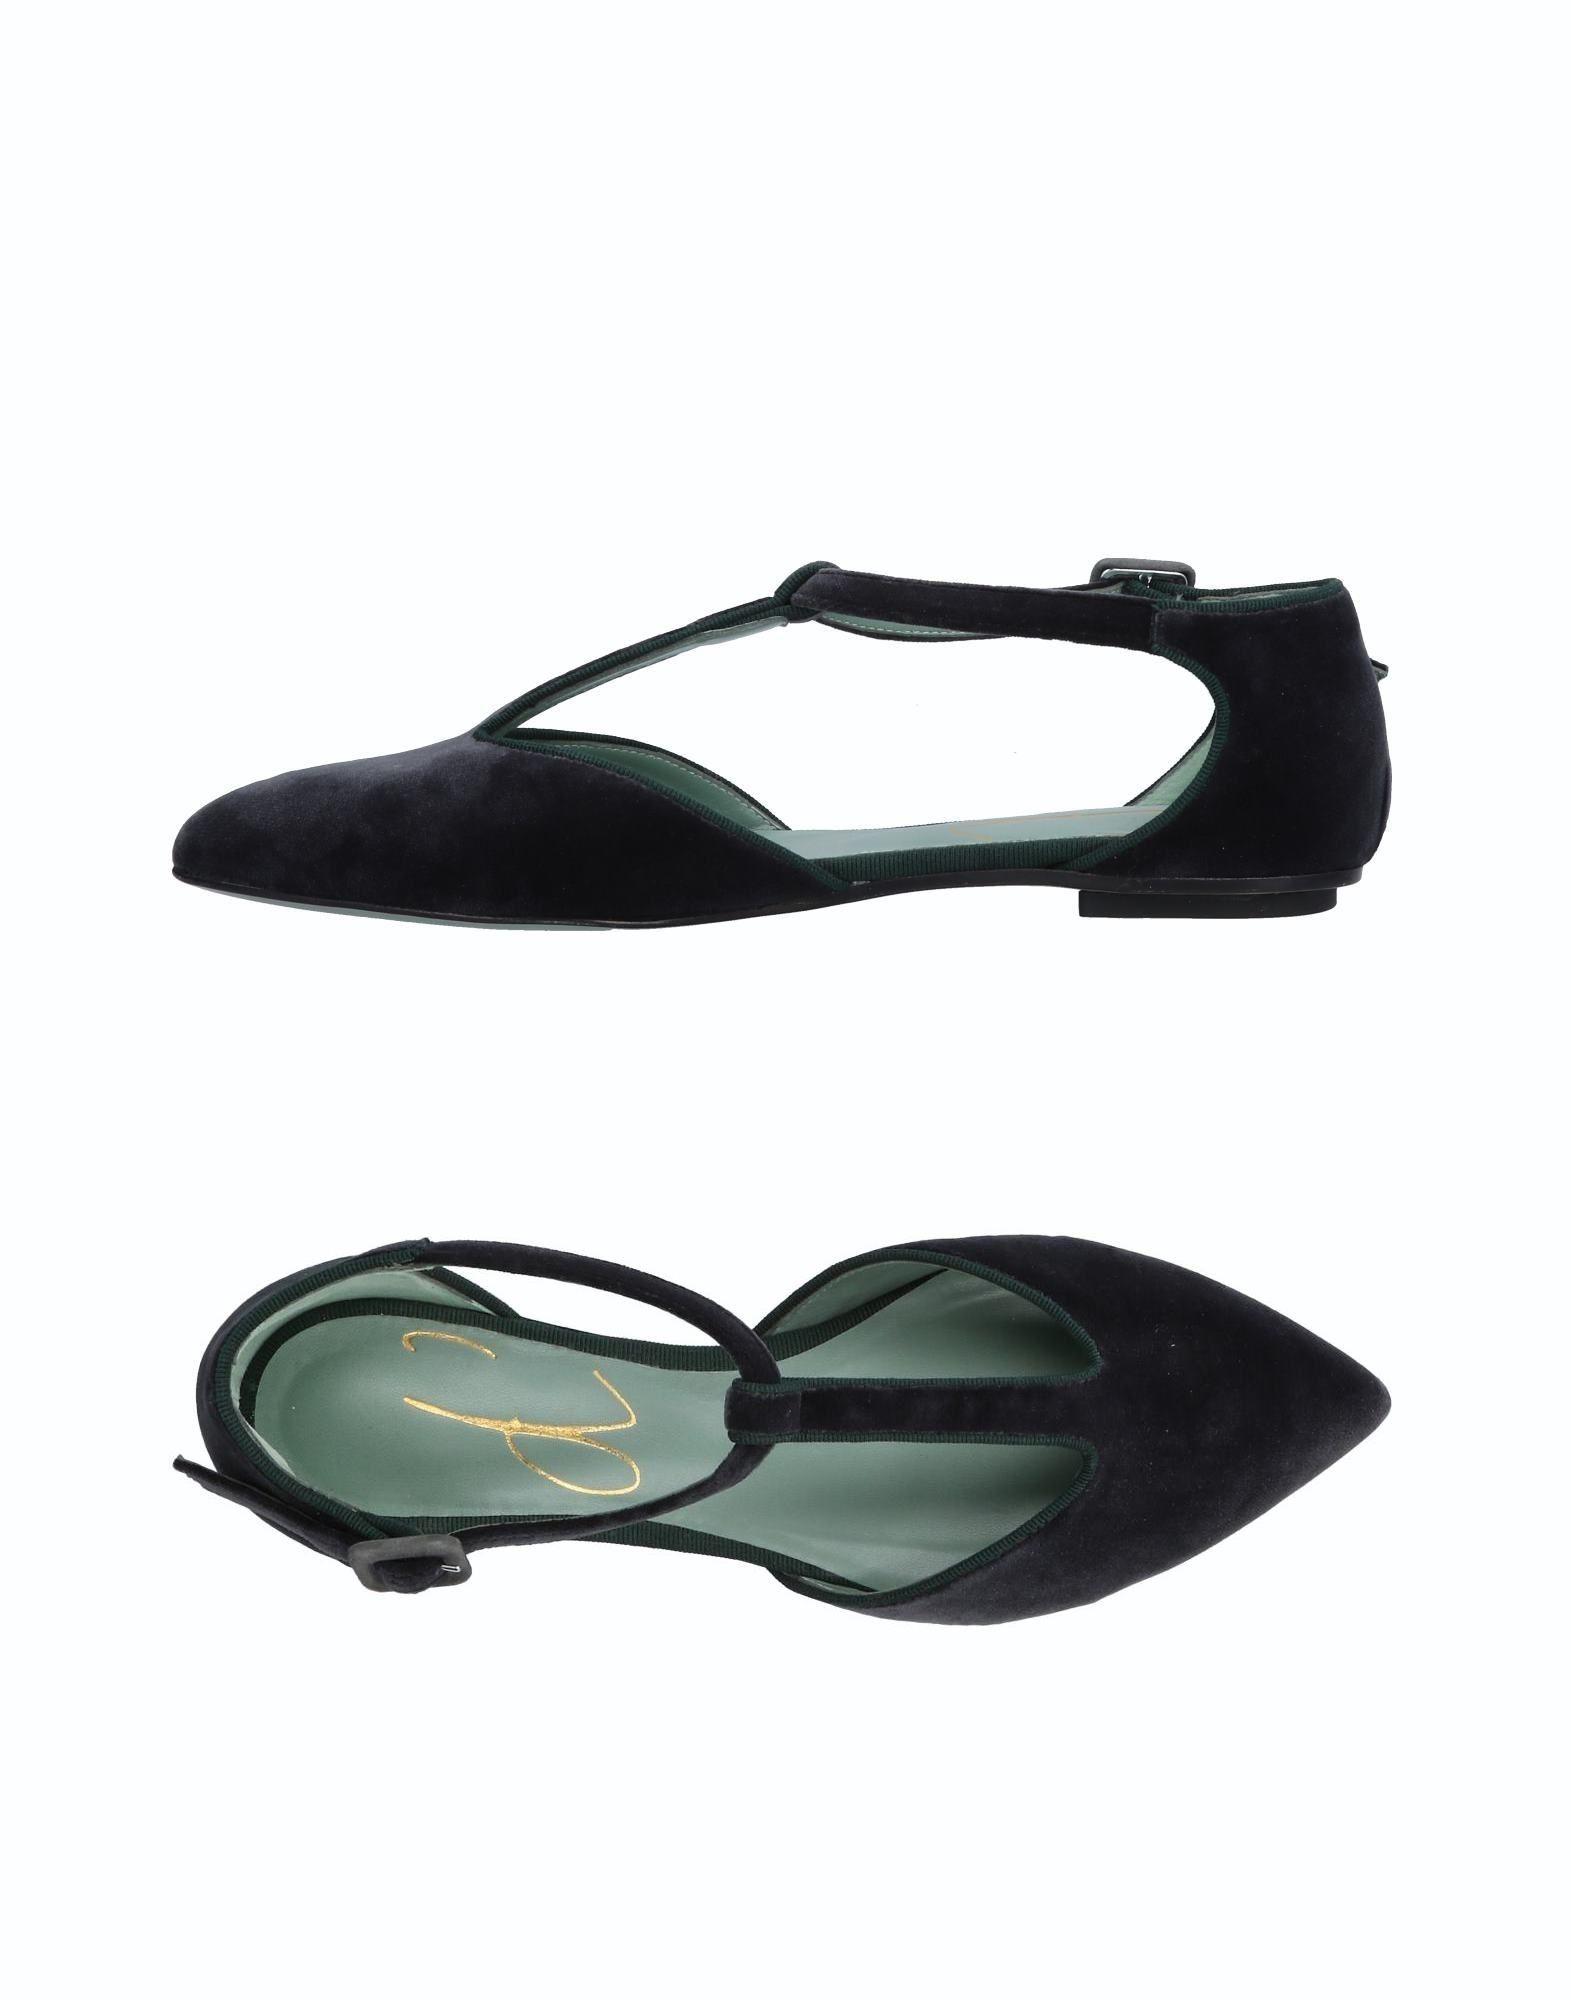 Paola D'arcano D'arcano Sandals - Women Paola D'arcano D'arcano Sandals online on  Australia - 11501264GB ff5b4a